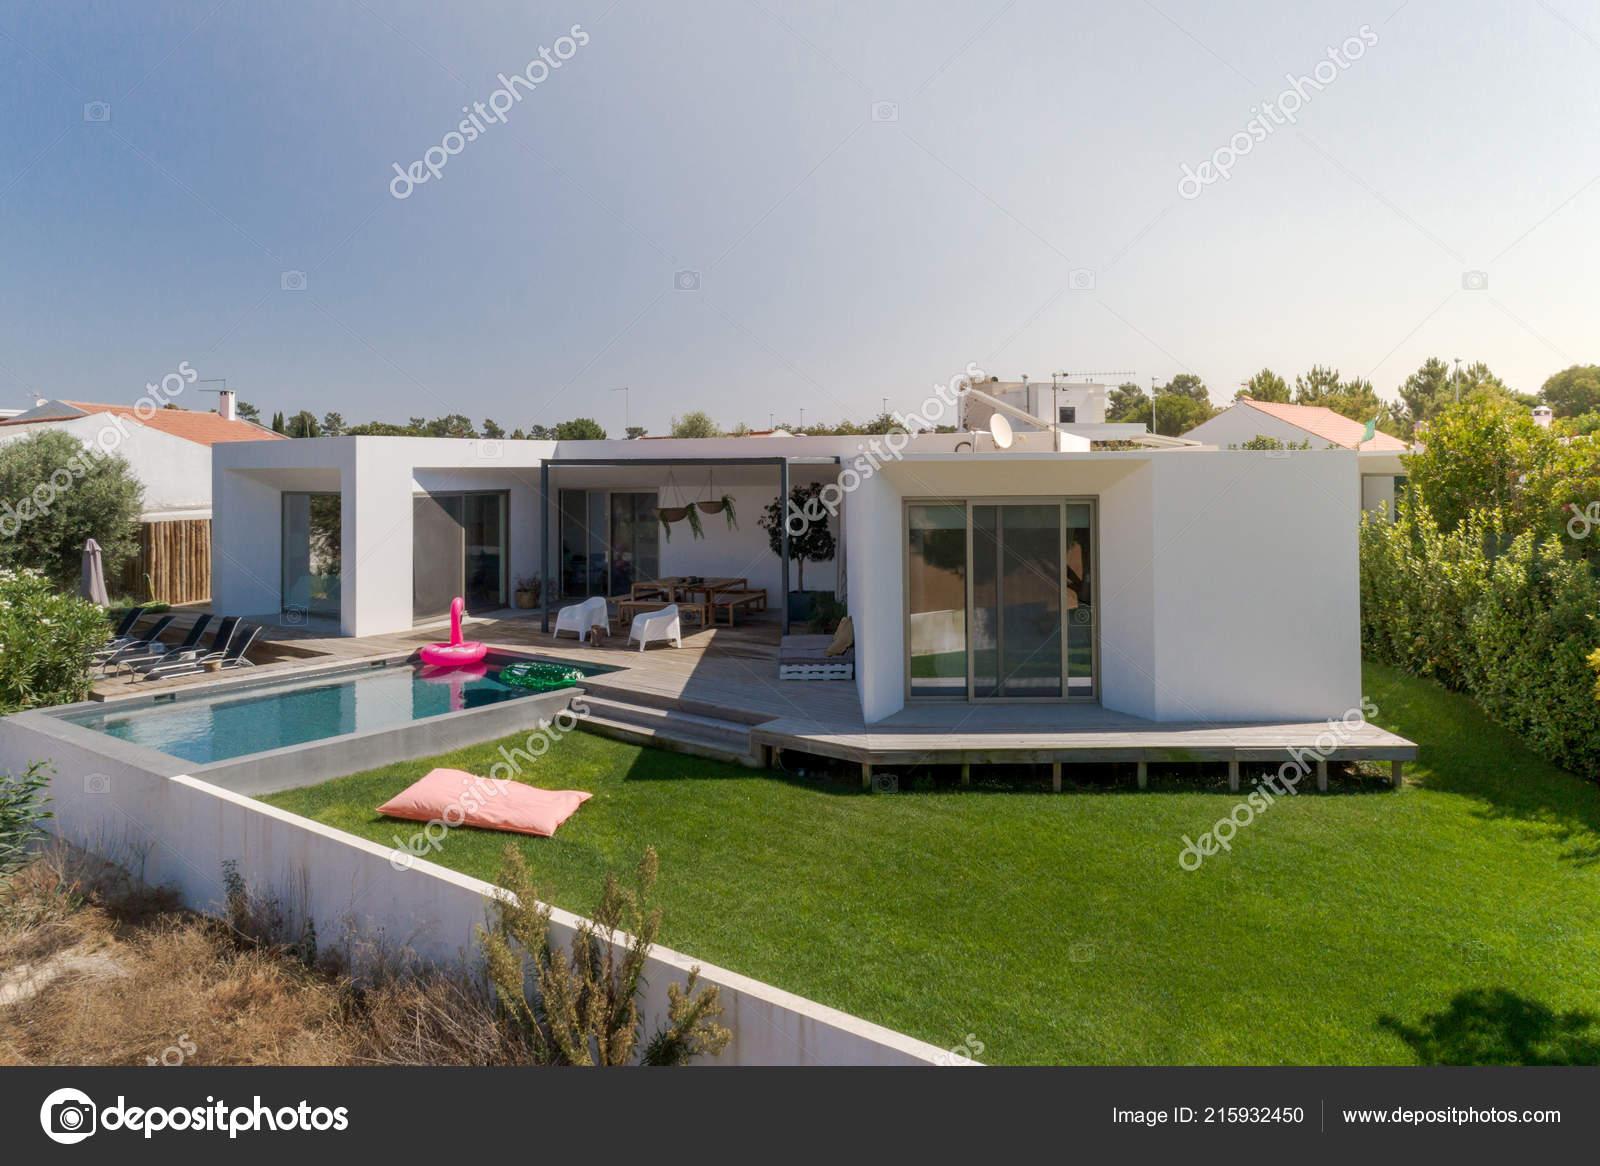 Vue Aérienne Maison Moderne Avec Jardin Piscine Terrasse Bois ...